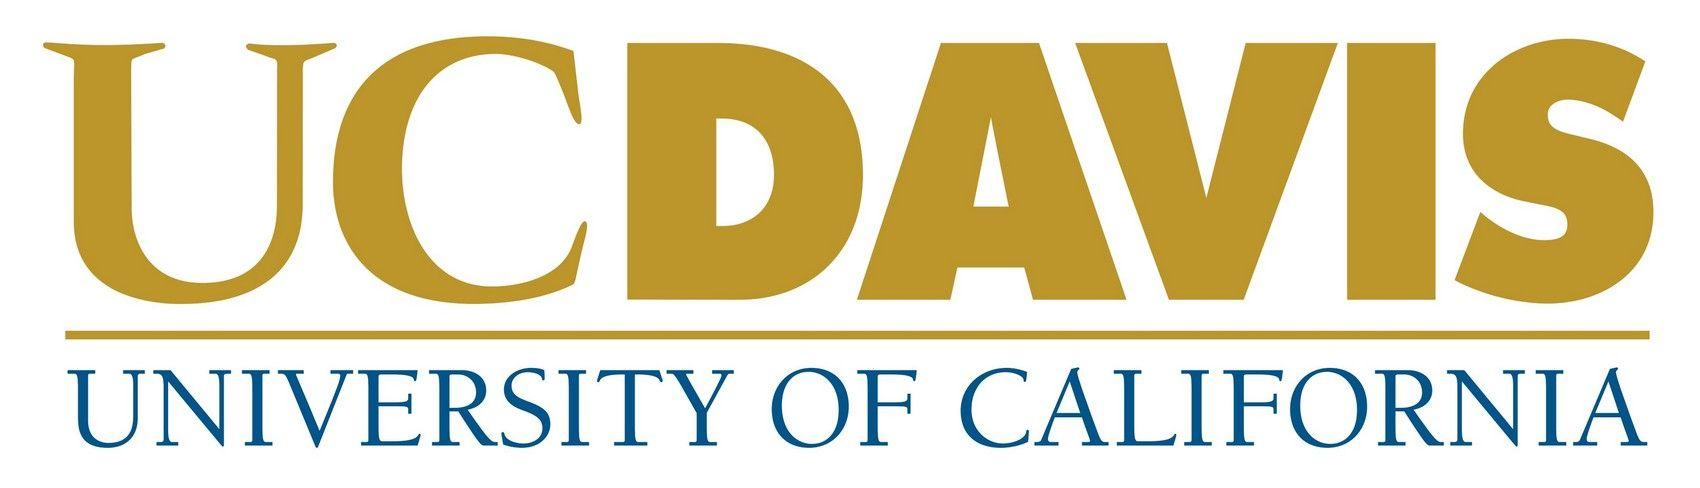 Ucdavis university of california davis arm eps file aau ucdavis university of california davis arm eps file aau aggies american universities amerikadaki niversiteler amerikan niversiteleri altavistaventures Gallery